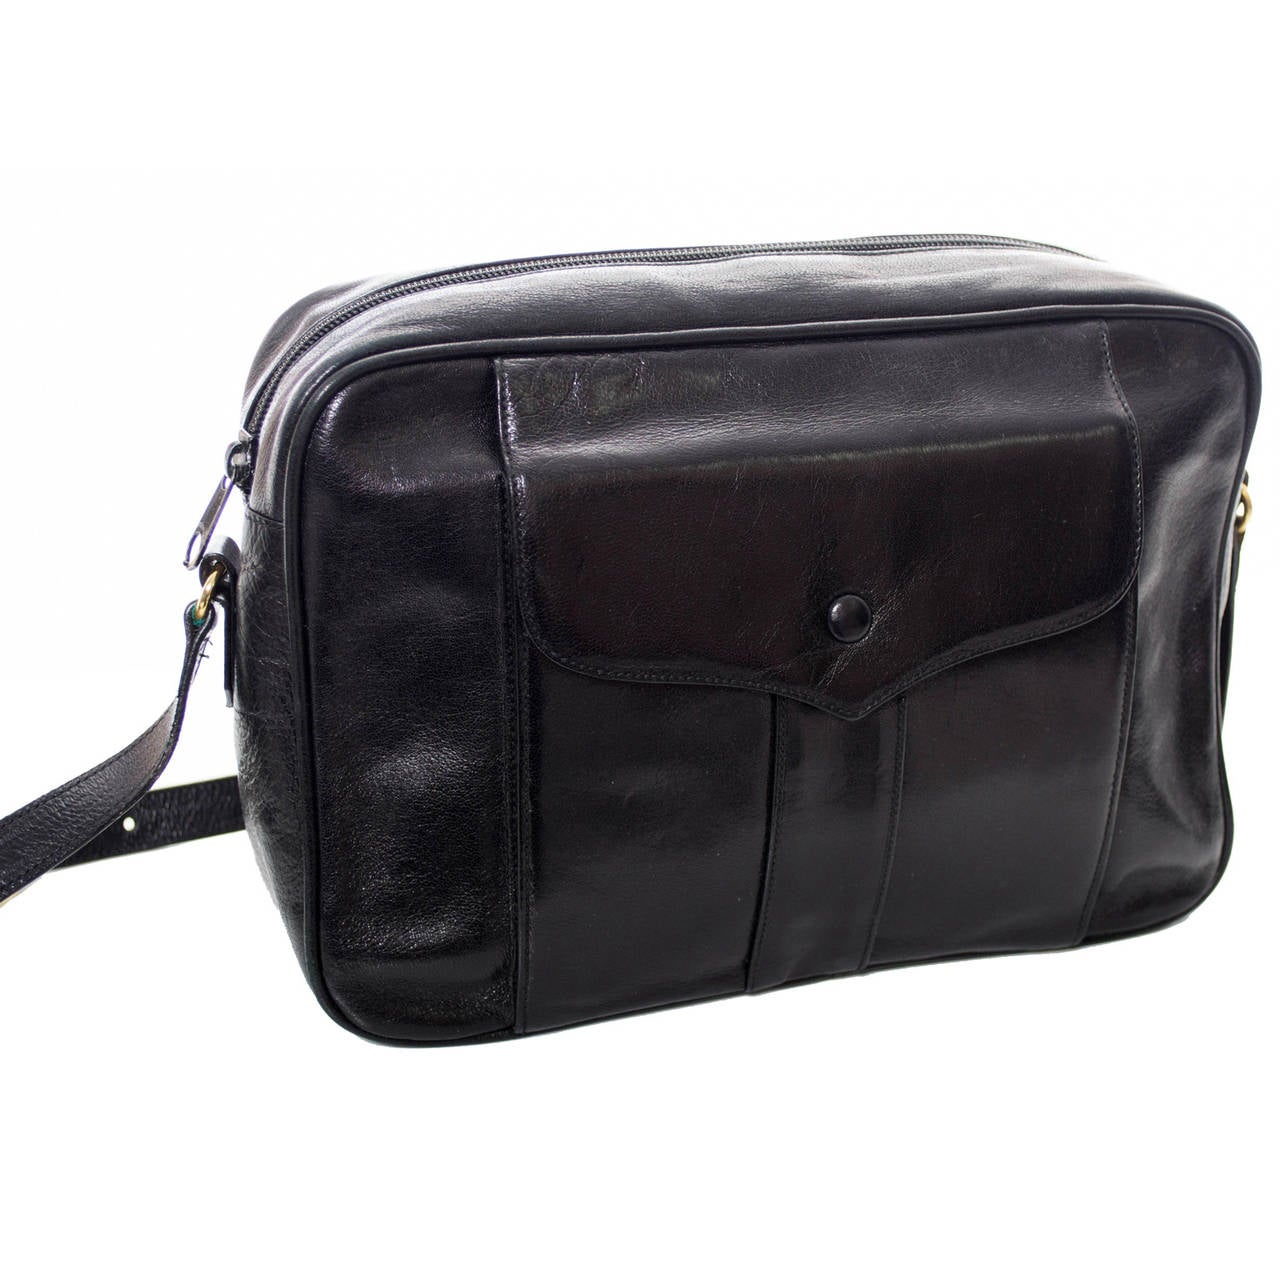 yves saint laurent replica clutch - 1970s YSL Yves Saint Laurent Leather Vintage Handbag Shoulder Bag ...